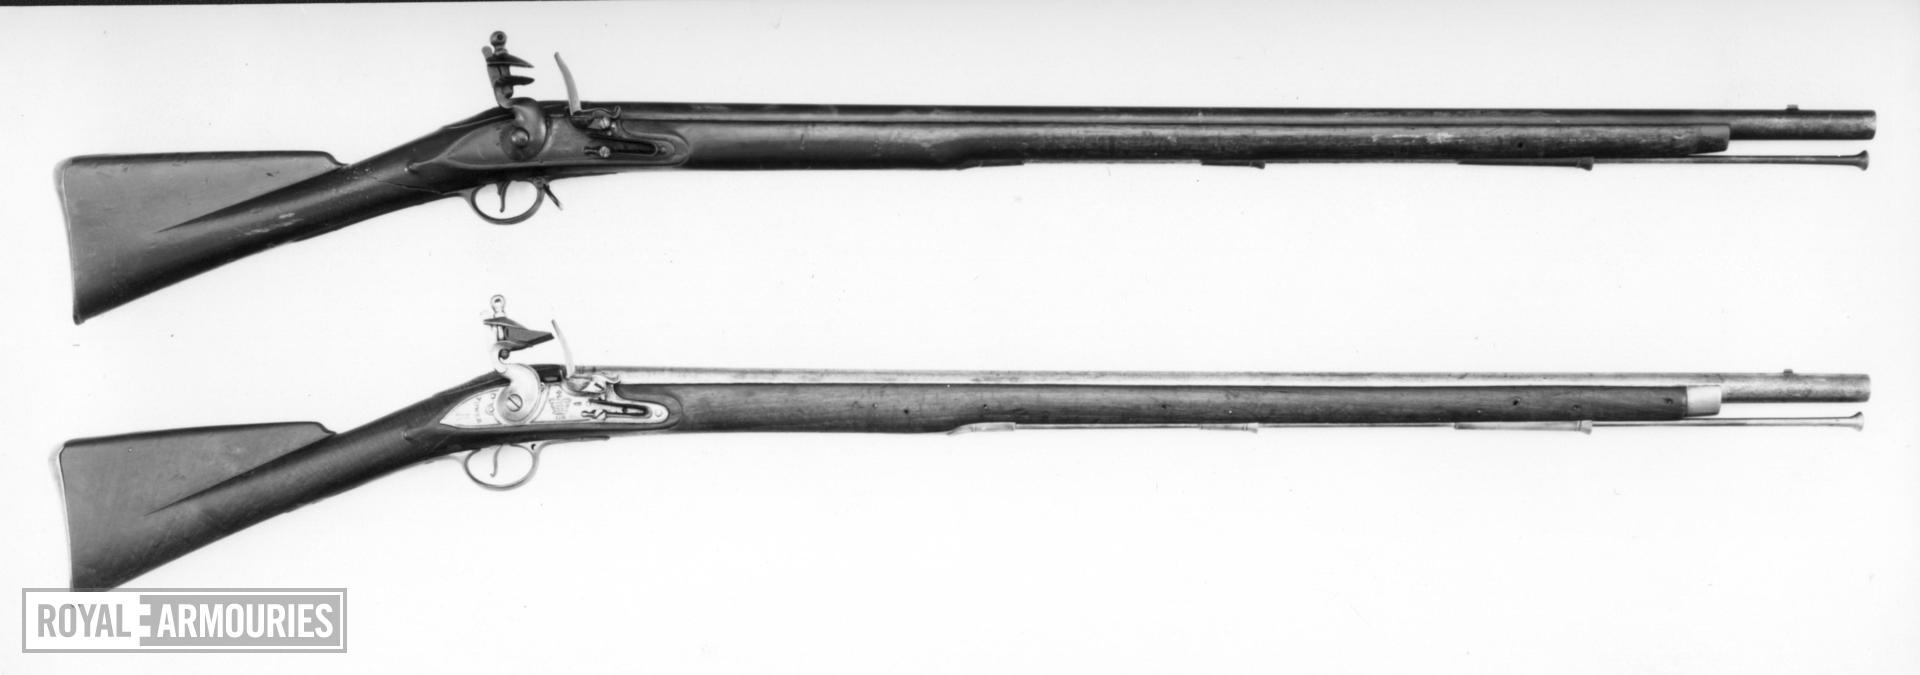 Flintlock muzzle-loading military musket - Model 1793 India Pattern (Type I)